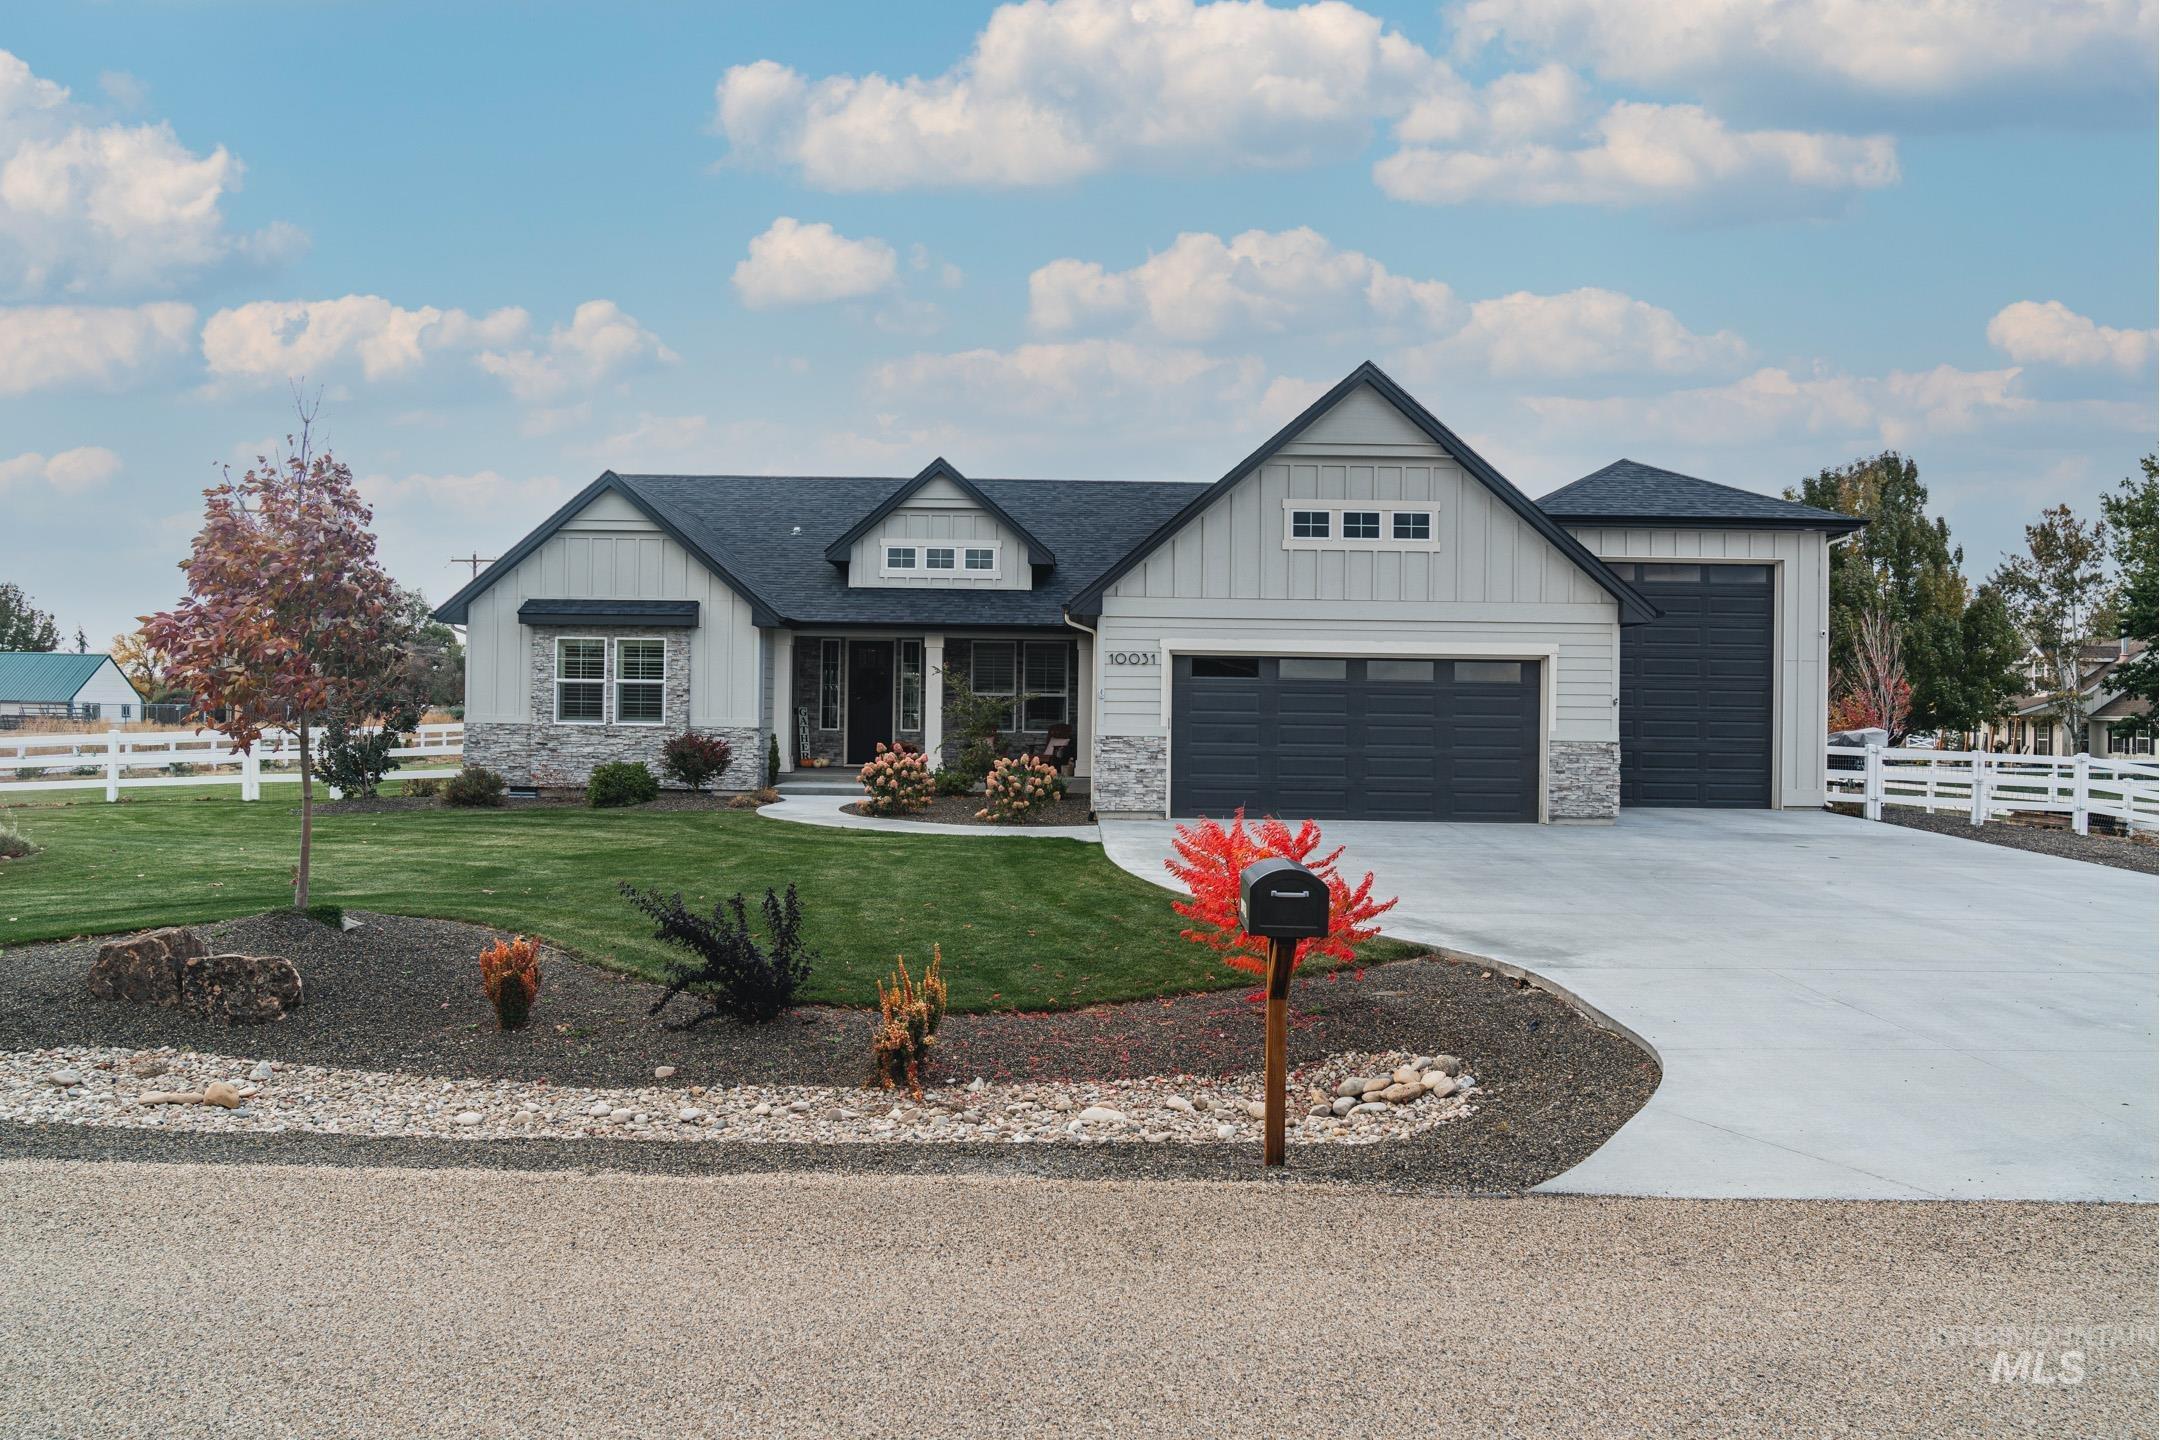 10031 Riverbend Place Property Photo